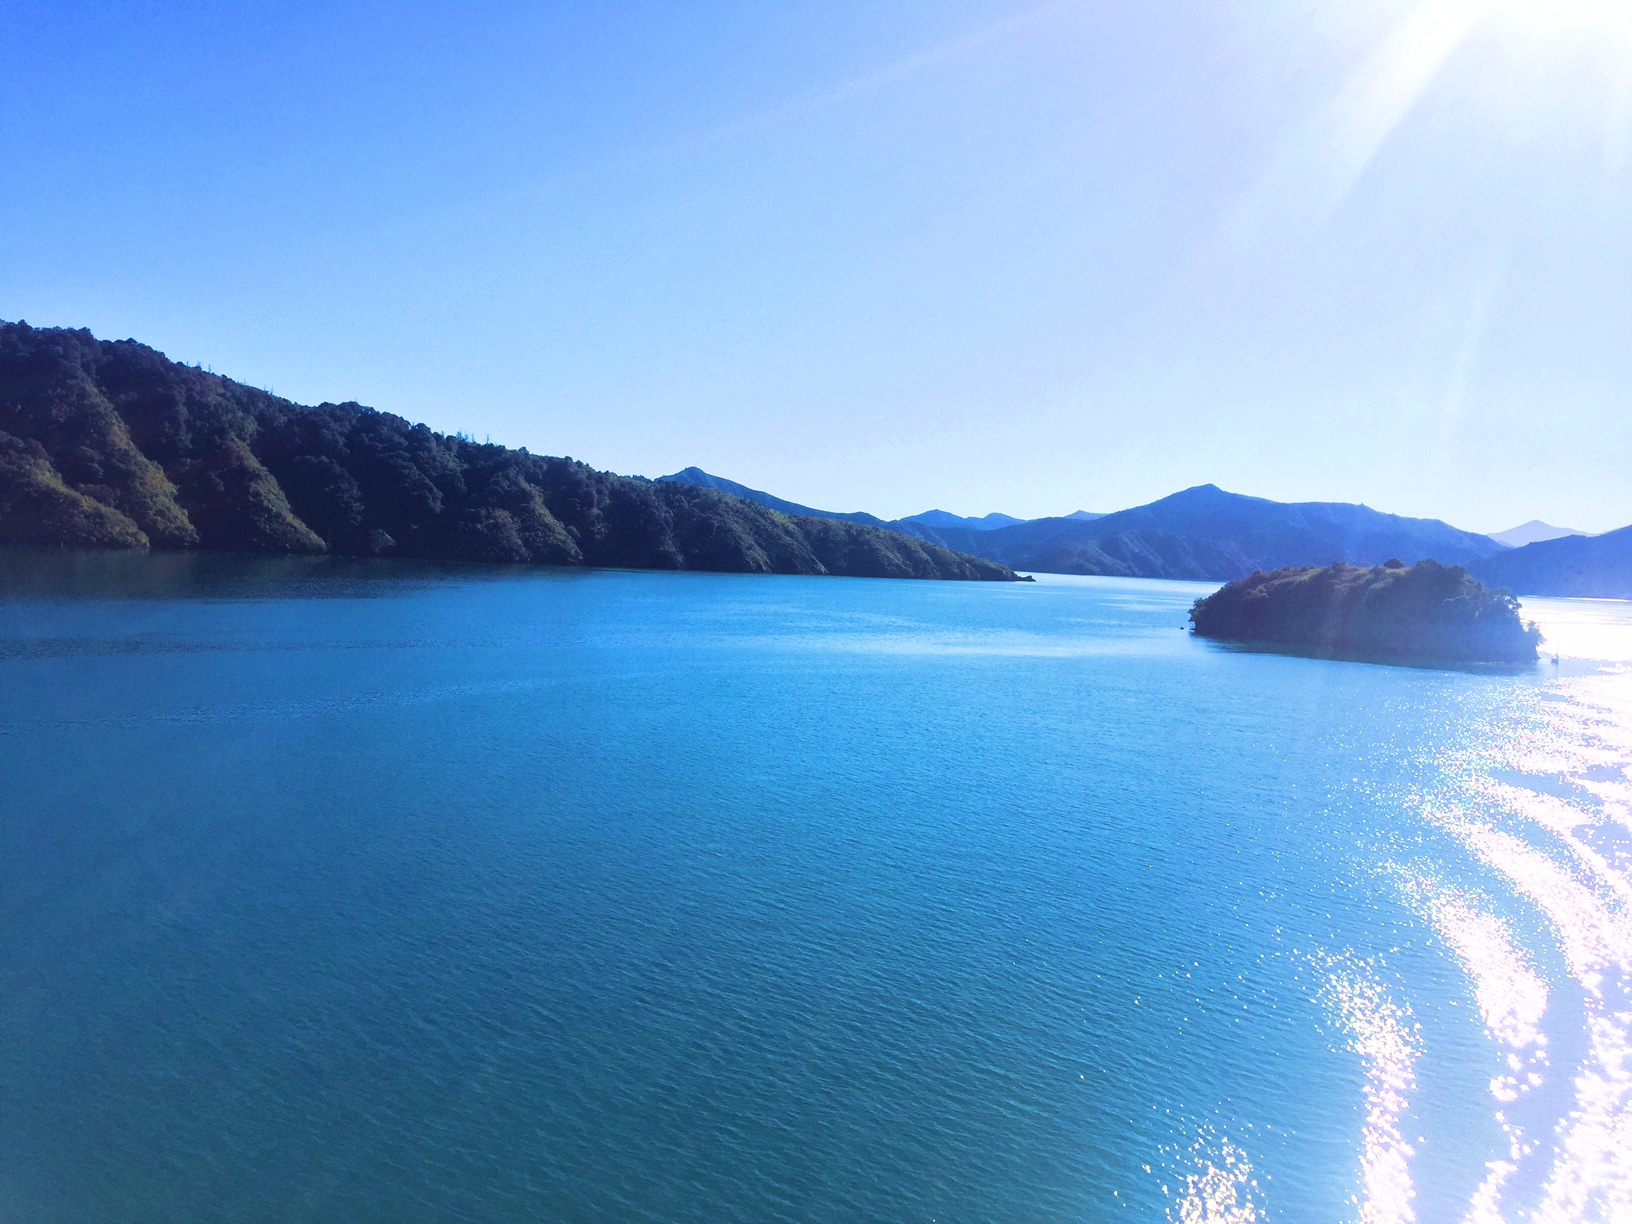 Enjoy New Zealand, my friends!